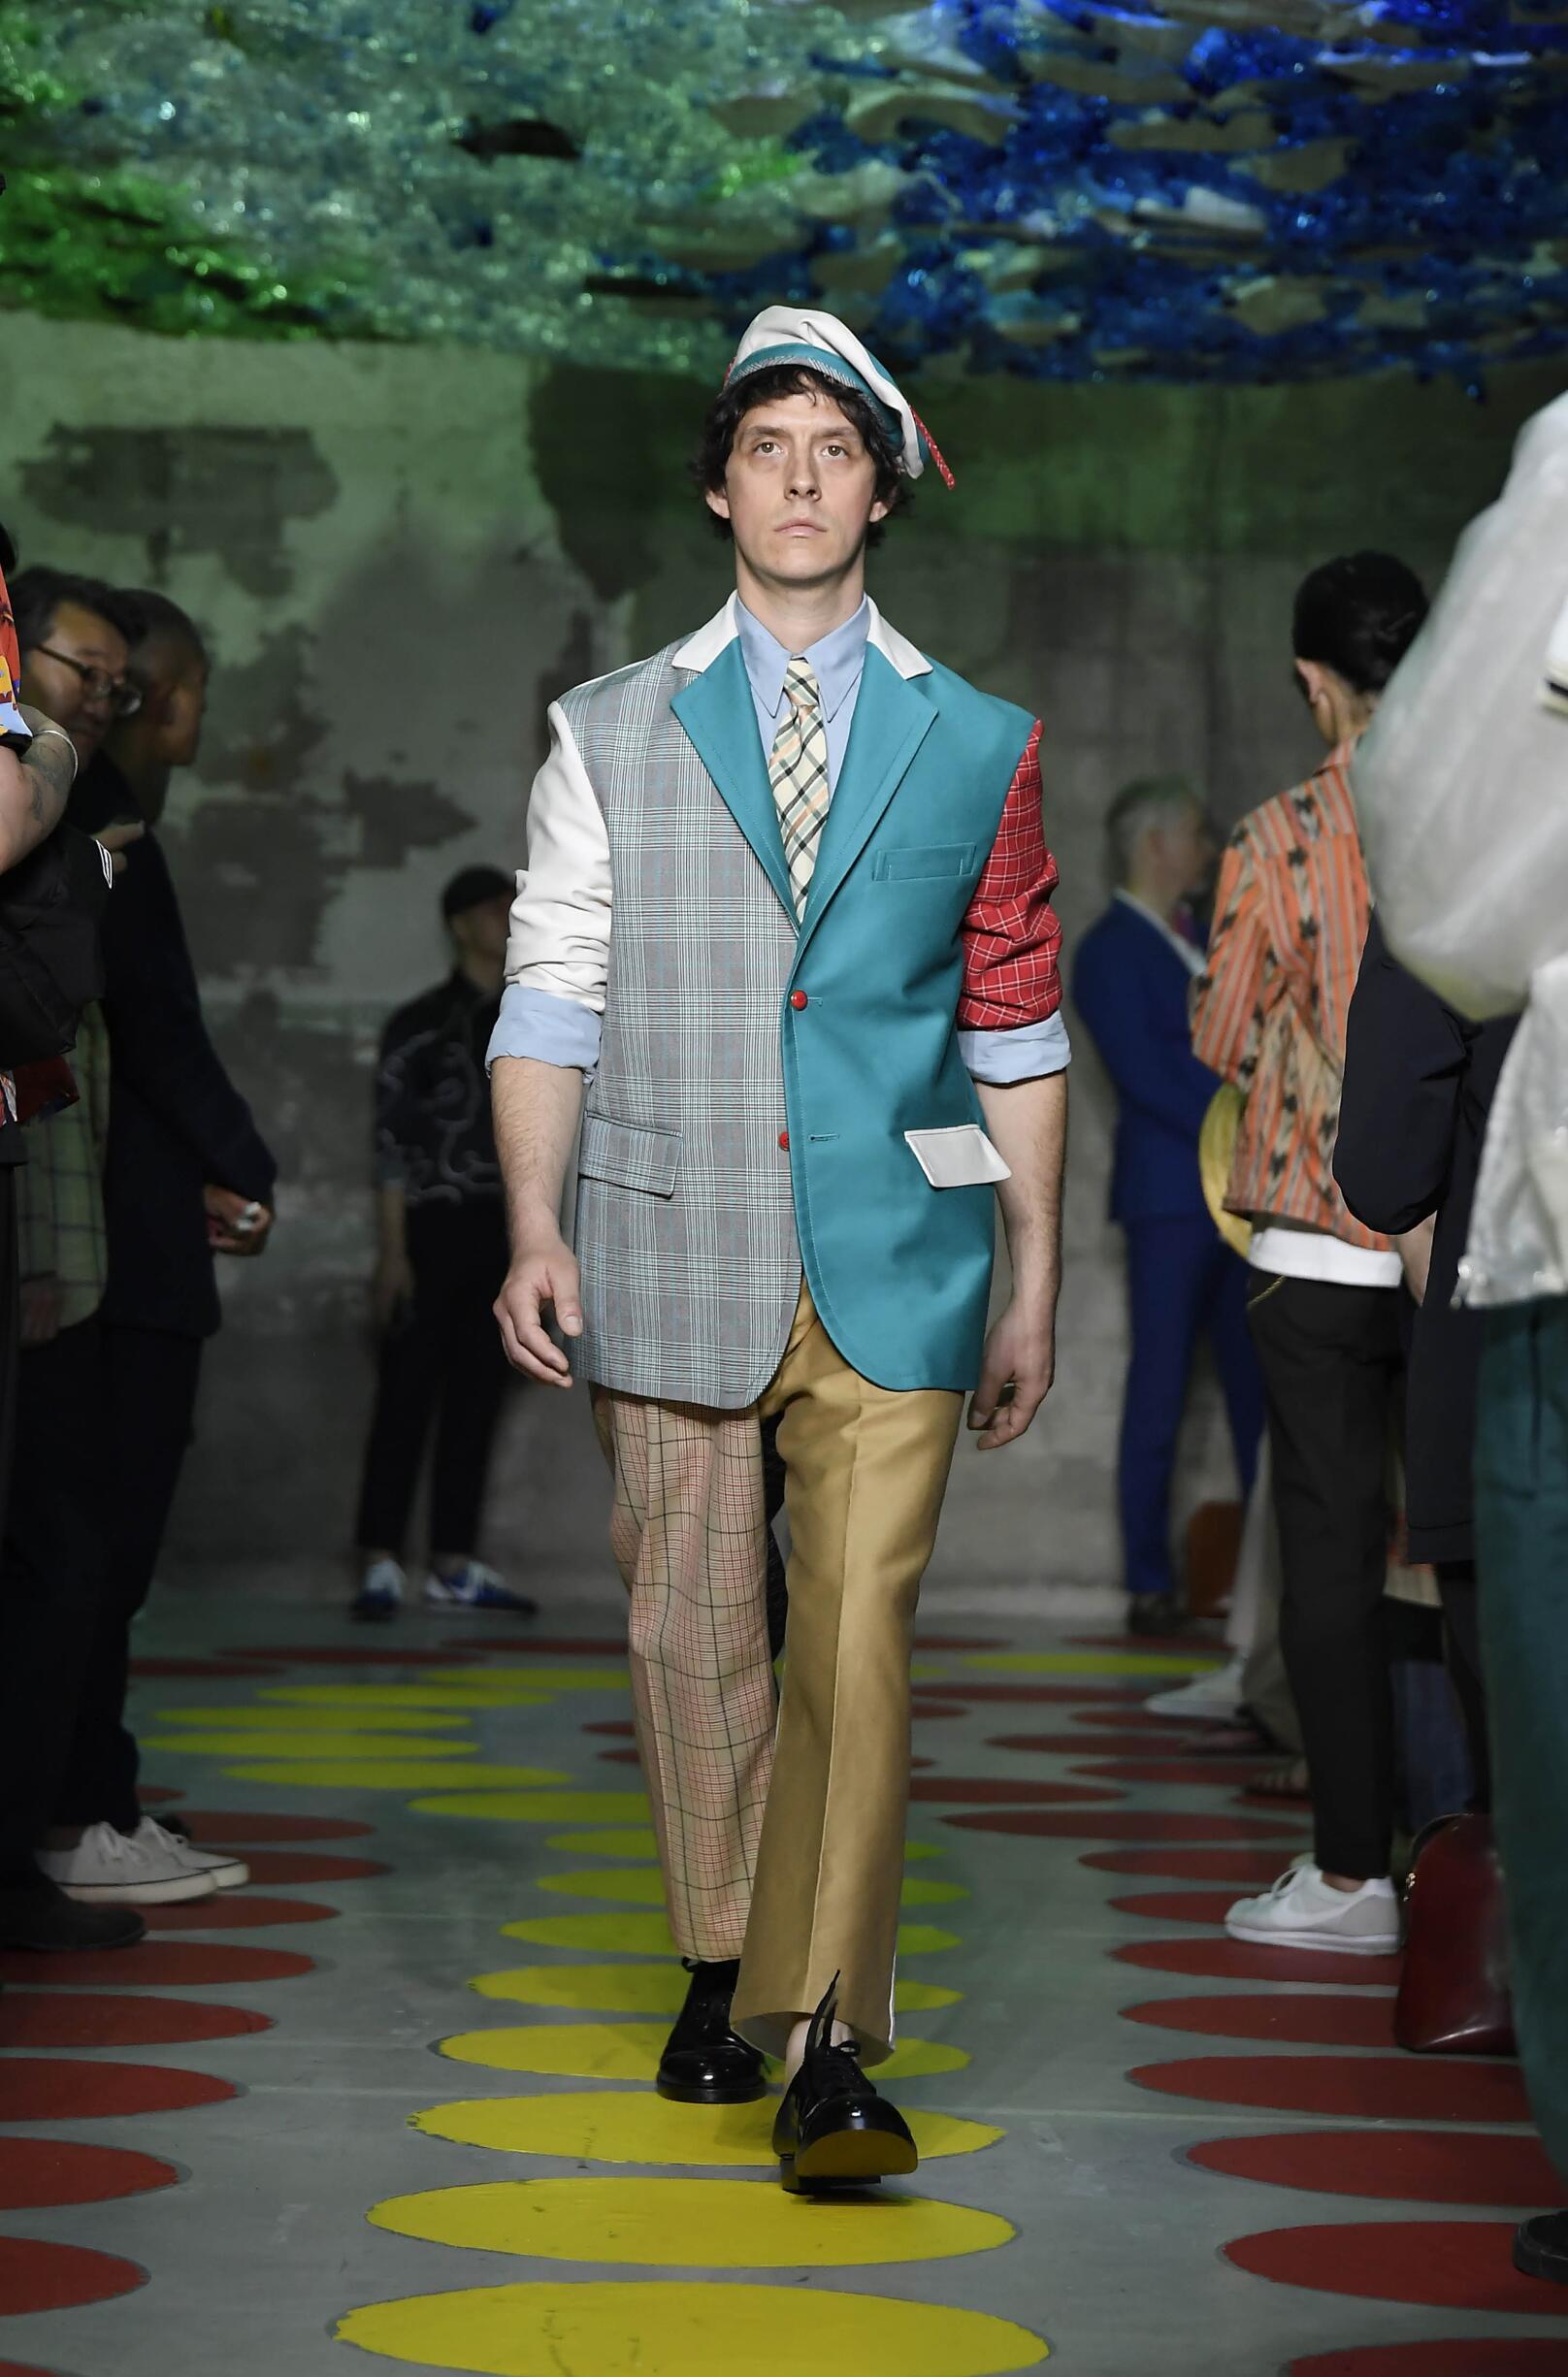 Man SS 2020 Marni Show Milan Fashion Week